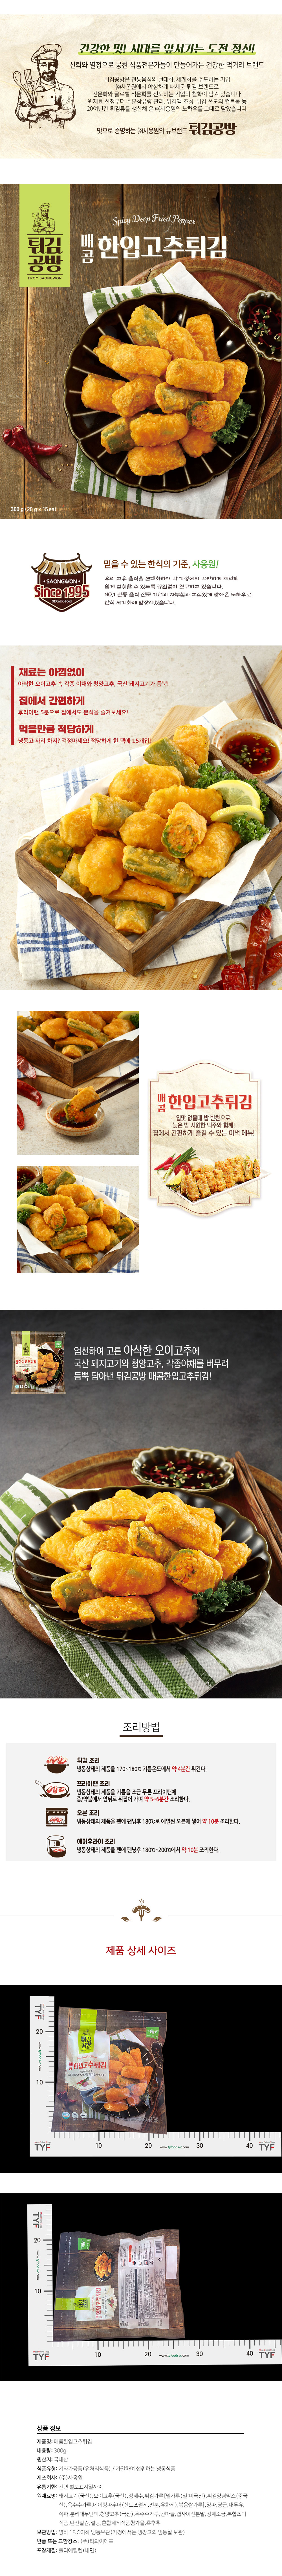 saongwon_friedpepper.jpg